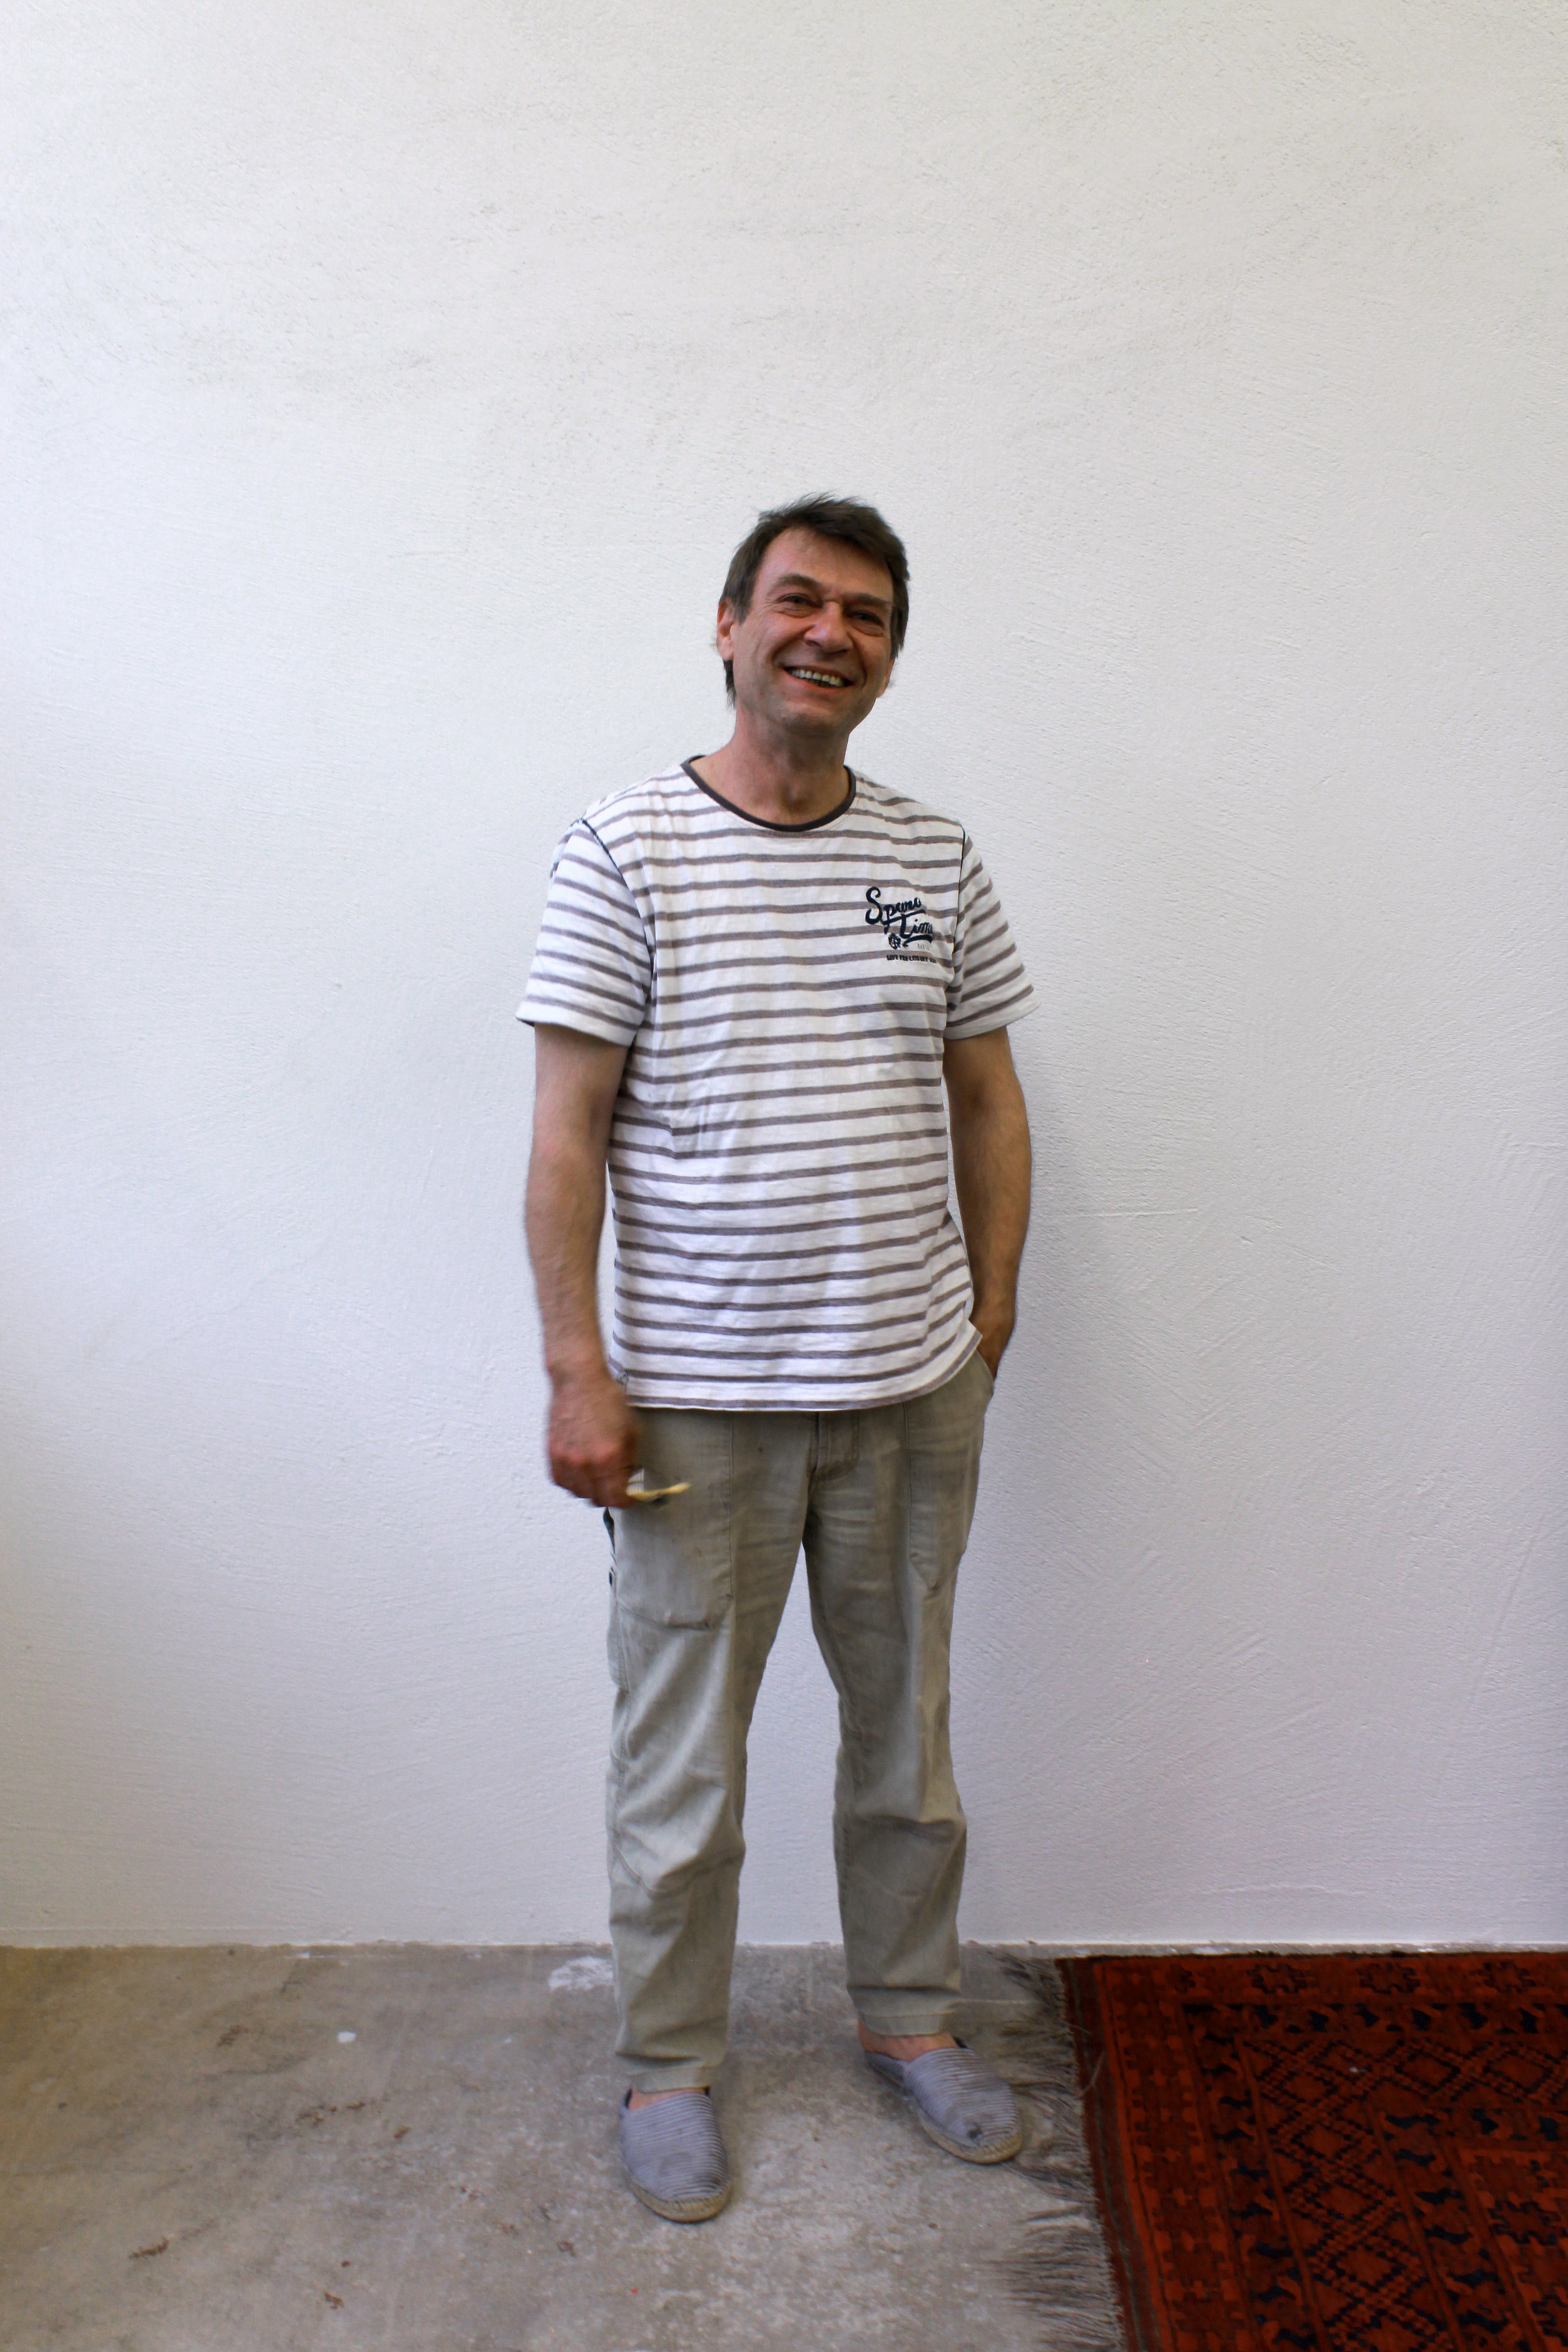 Stefan Schwendimann